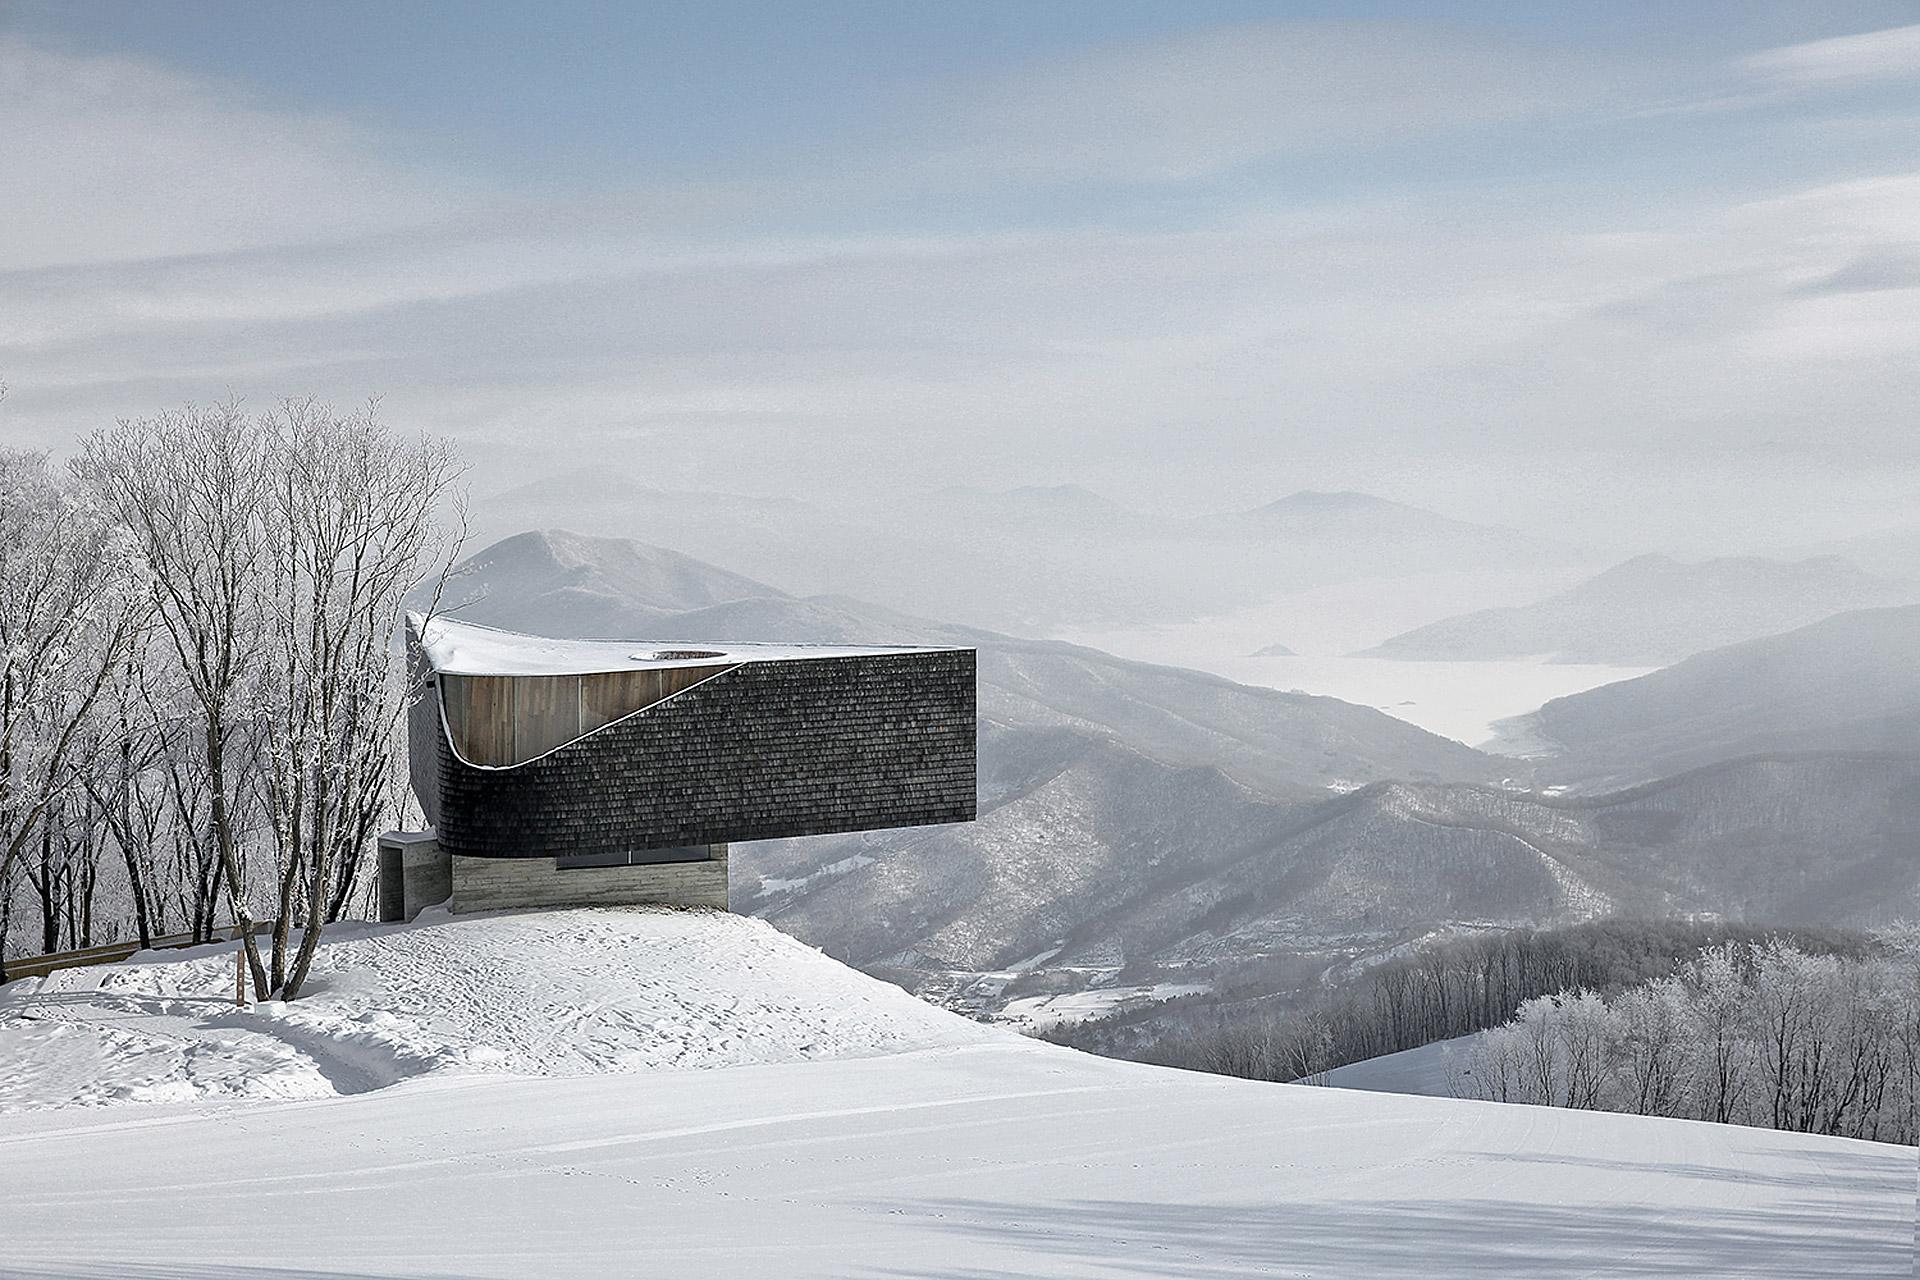 Songhua Lake Ski Overlook Uncrate